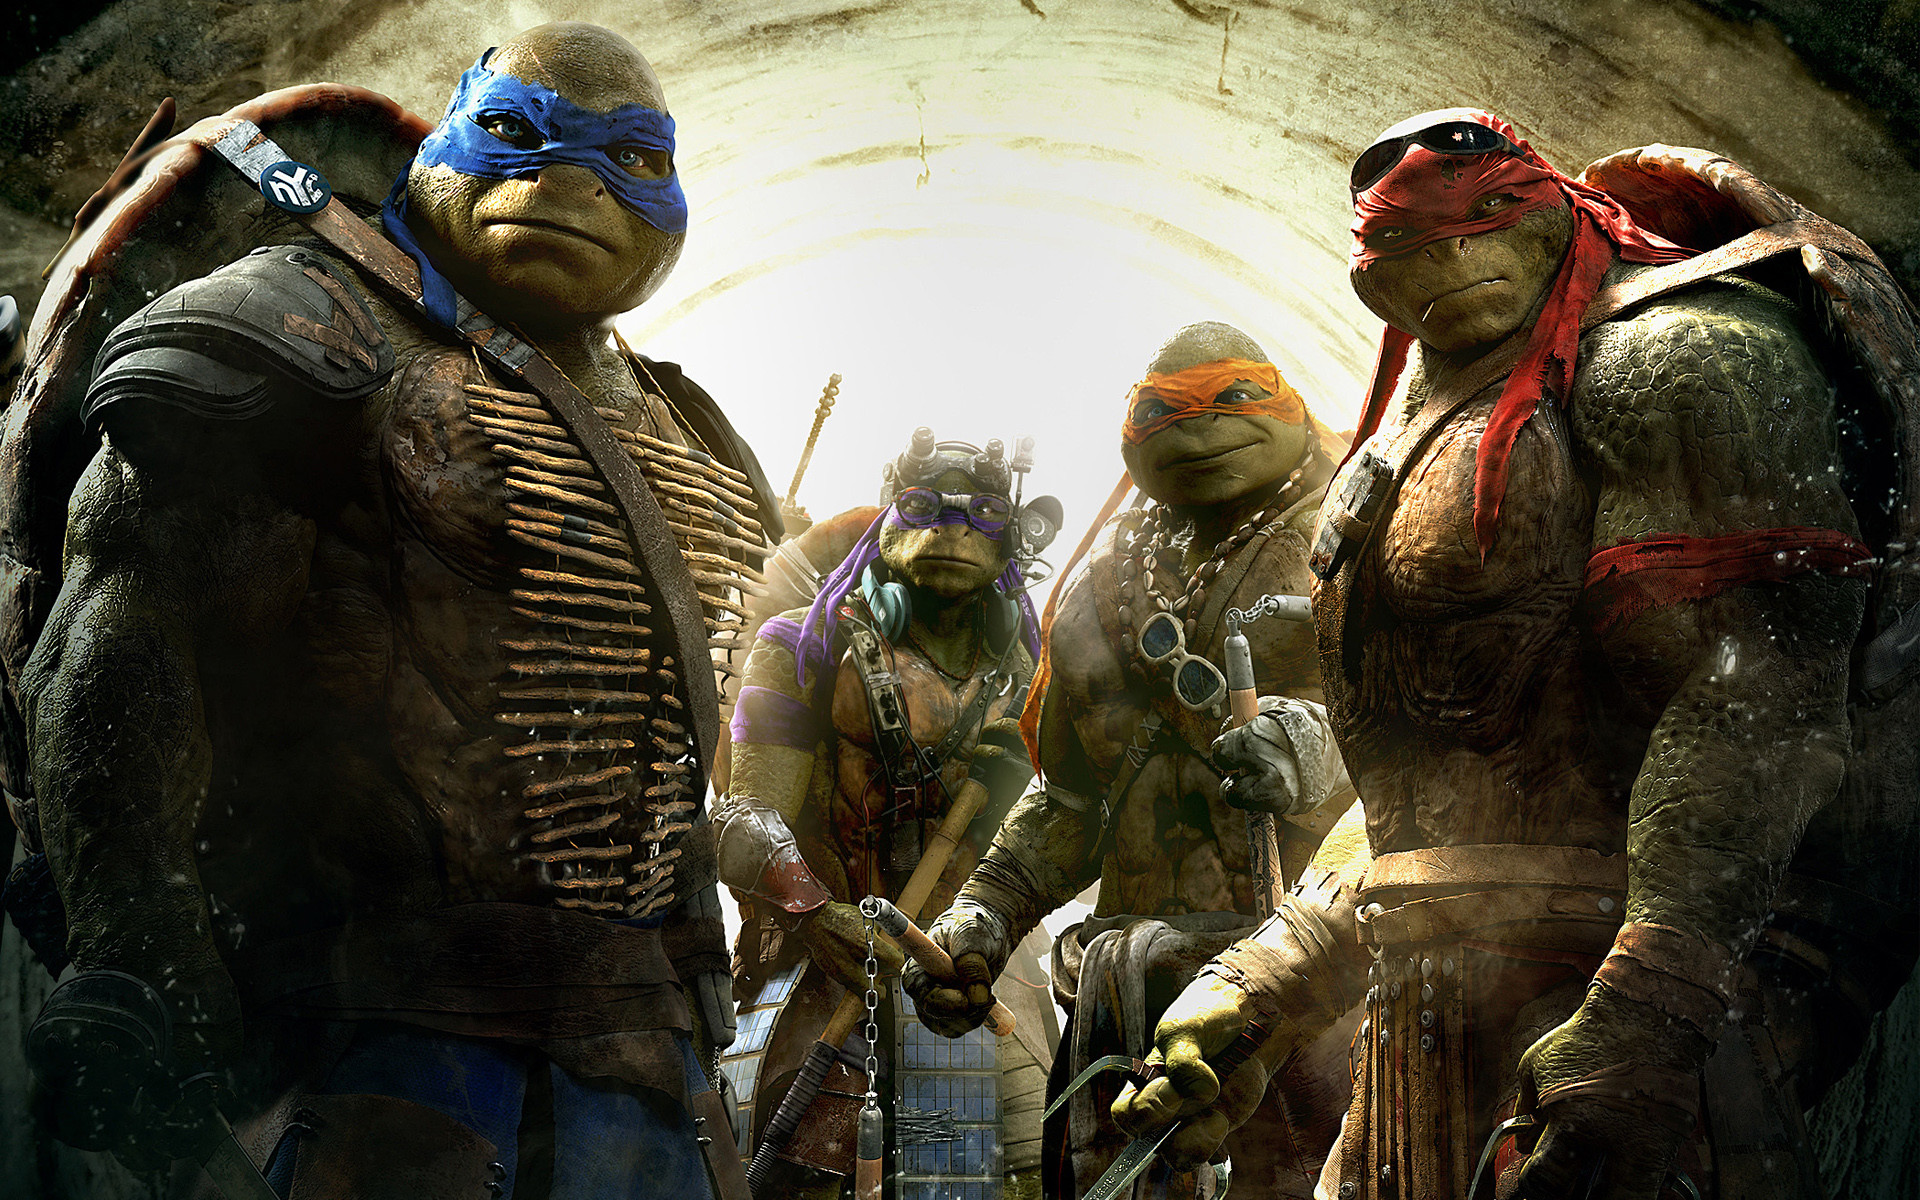 Teenage Mutant Ninja Turtles high resolution wallpapers